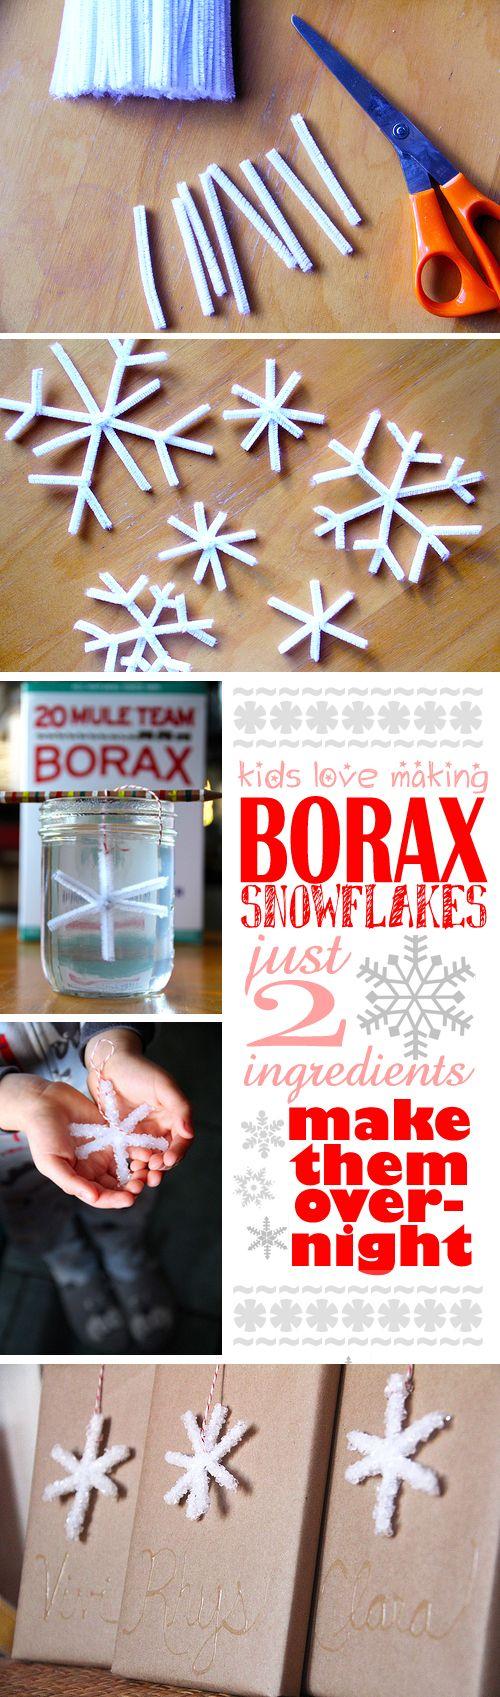 Easy Borax Snowflakes.